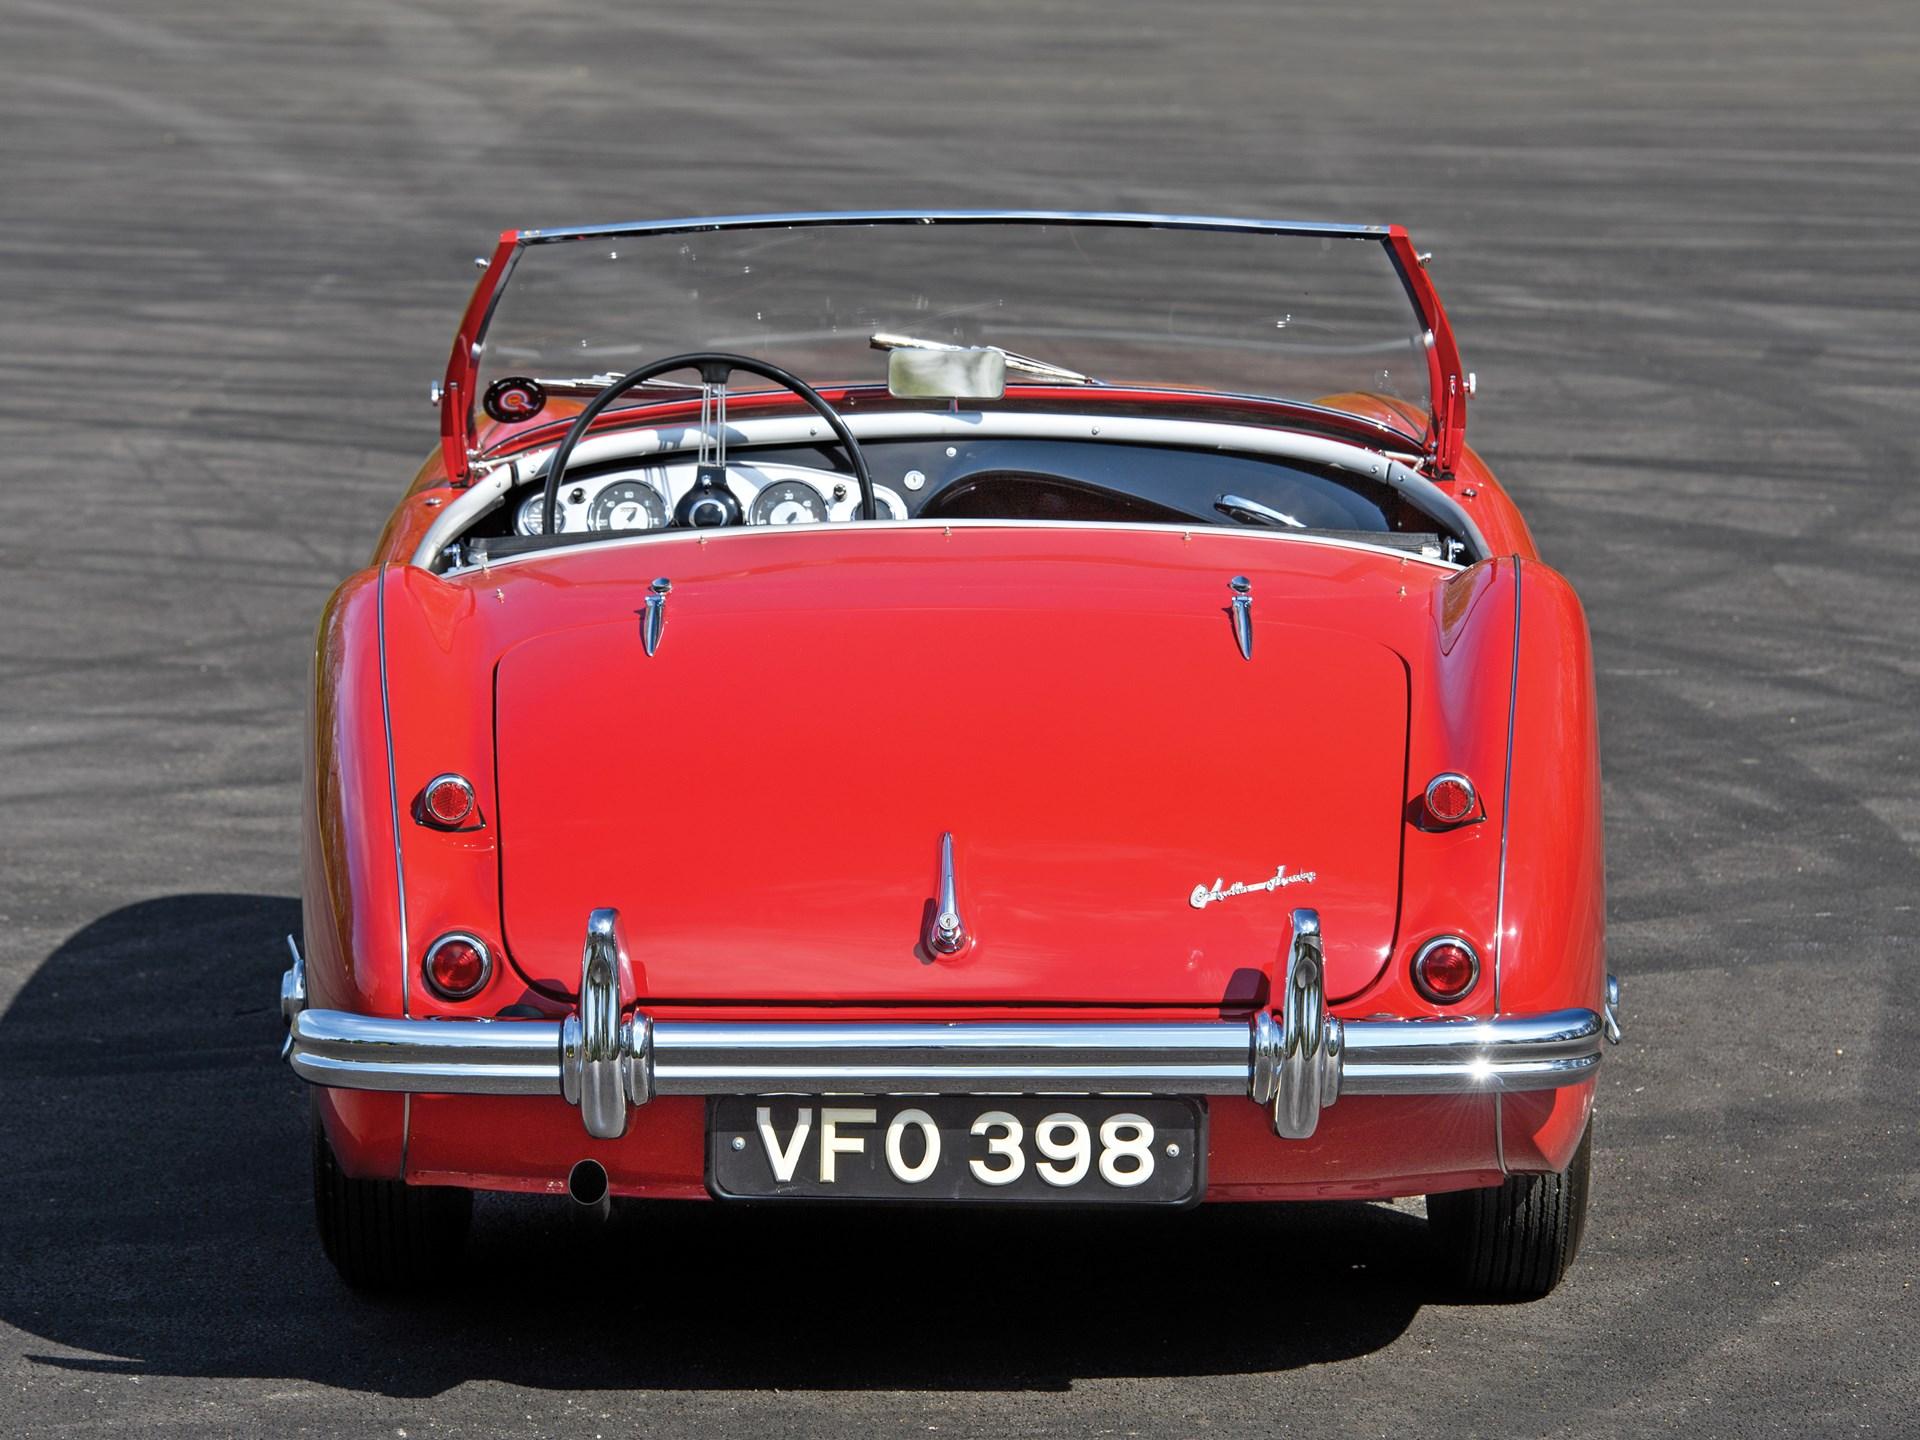 1955 Austin-Healey 100-4 BN2